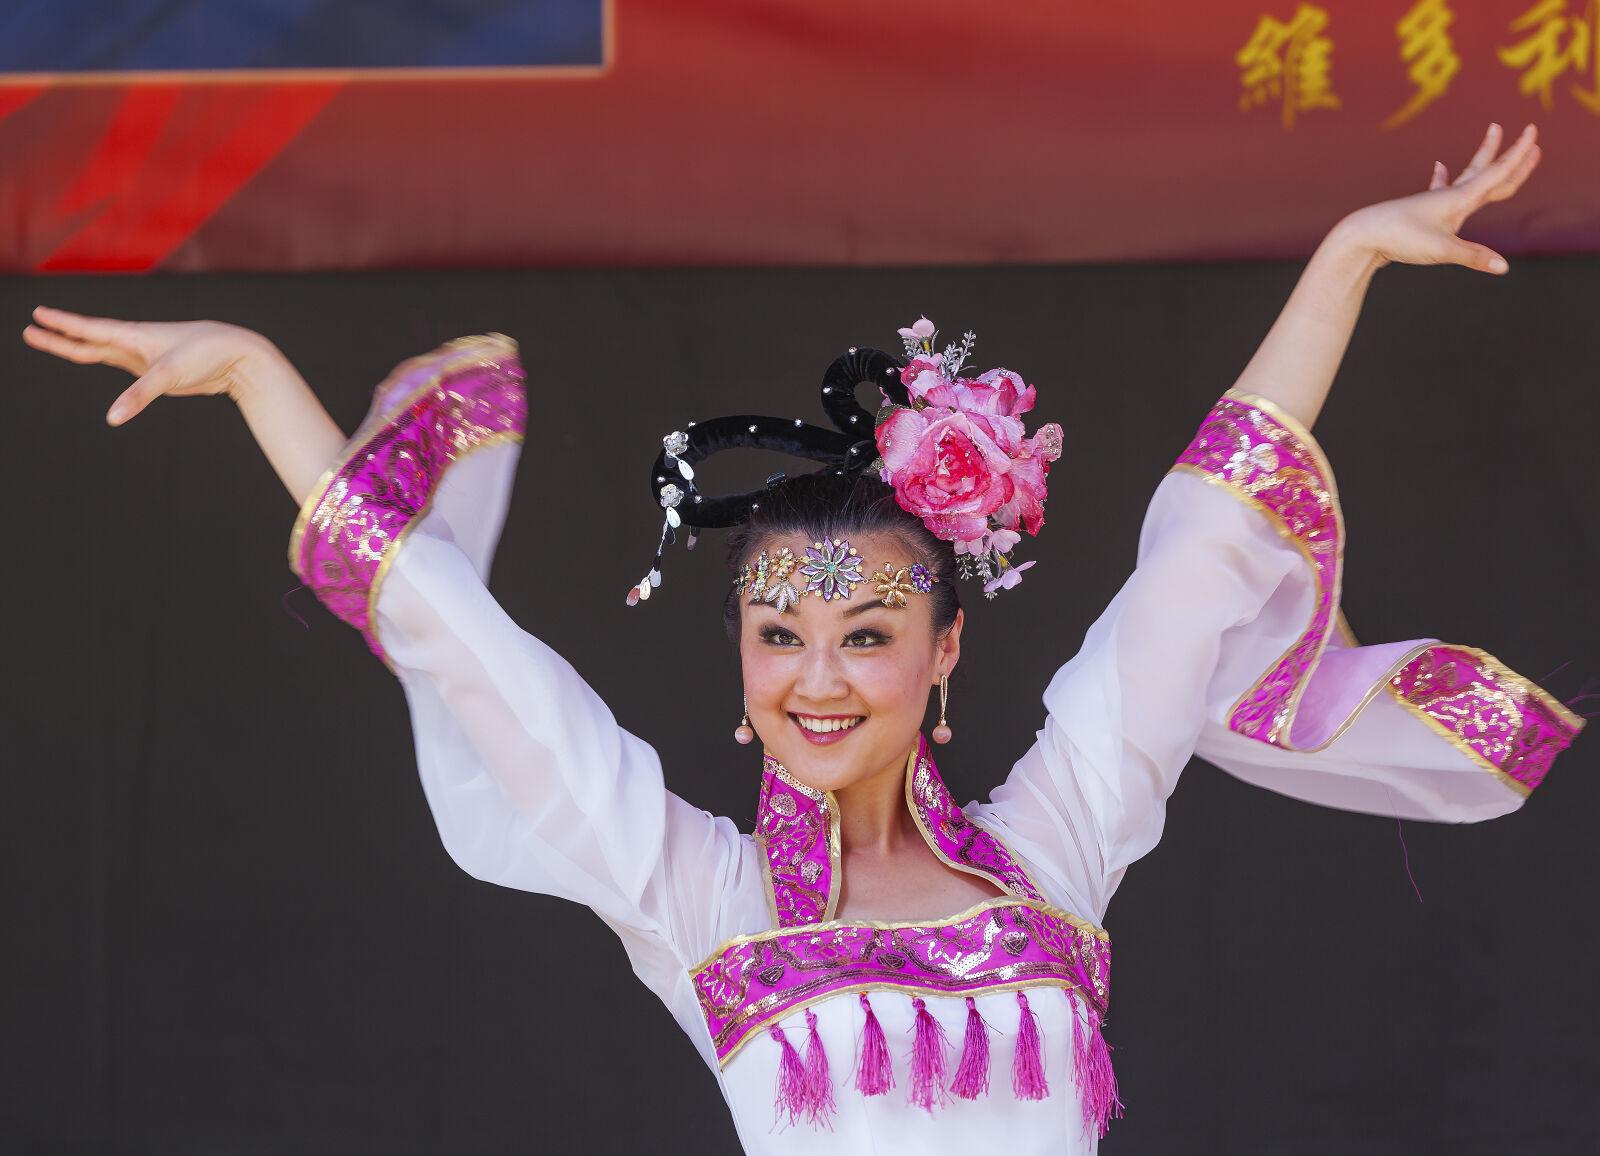 chinese, costume, dancer, flowers